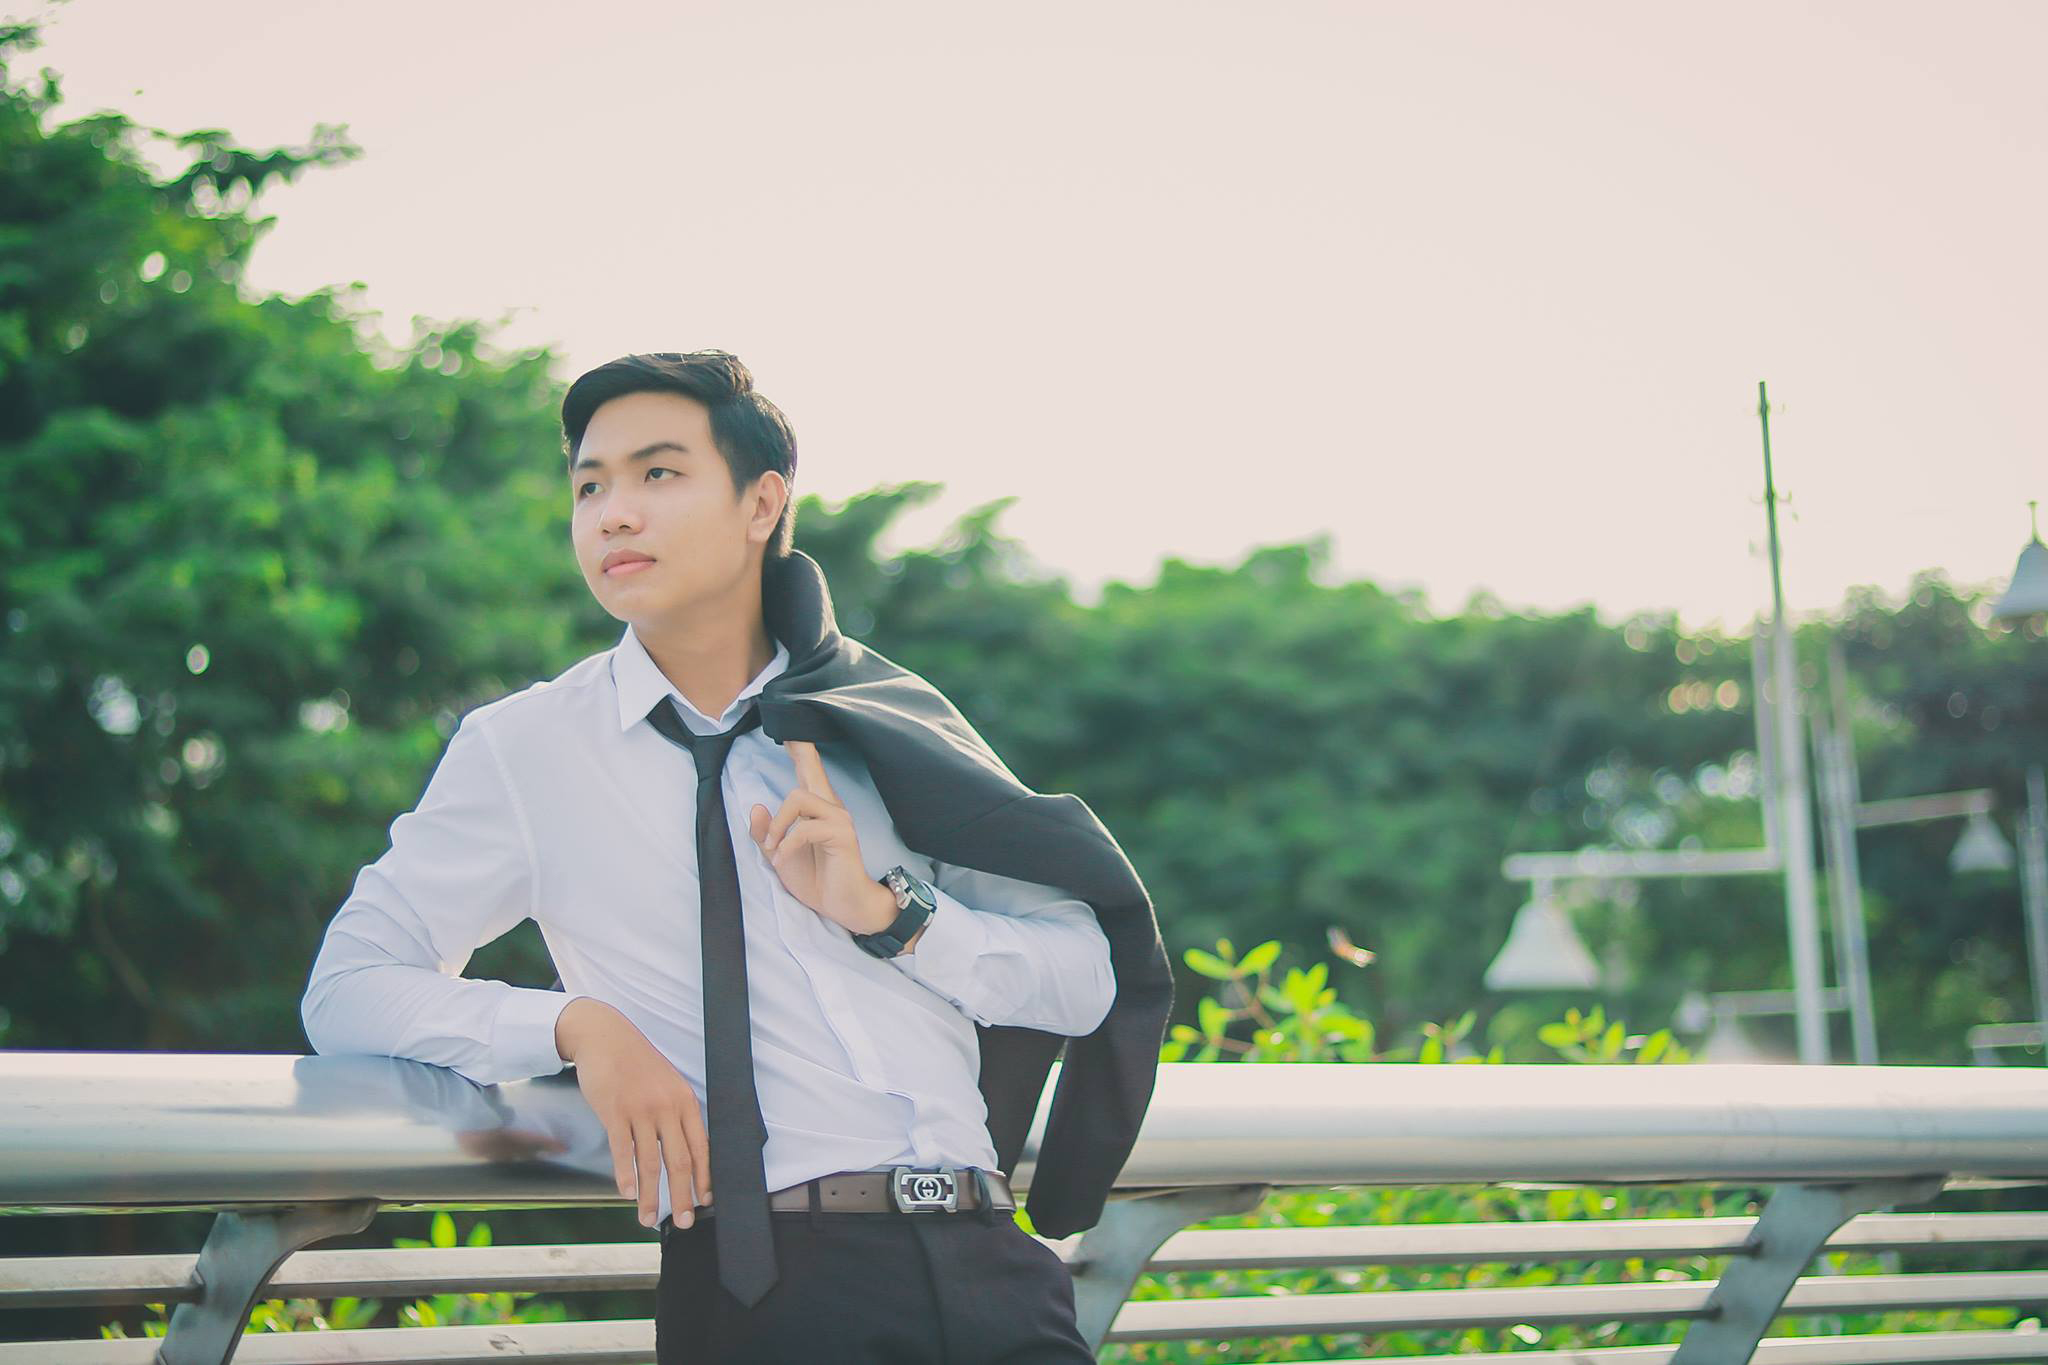 Avatar LE MINH NHON